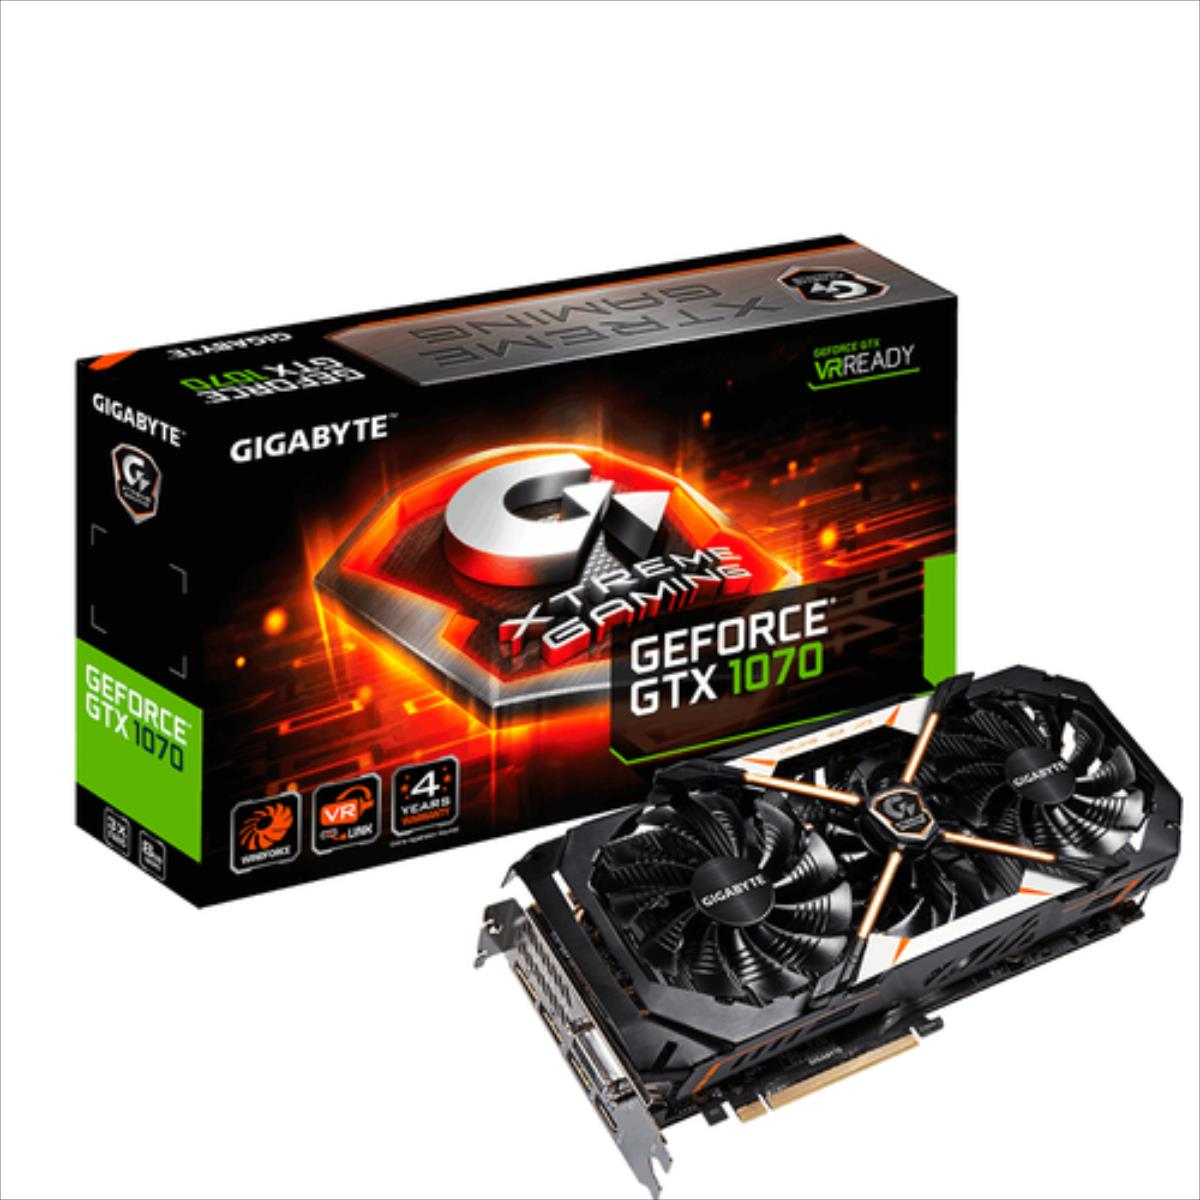 Gigabyte GeForce GTX 1070 Xtreme Gaming, 8GB GDDR5 (256 Bit), HDMI, DVI, 3xDP video karte